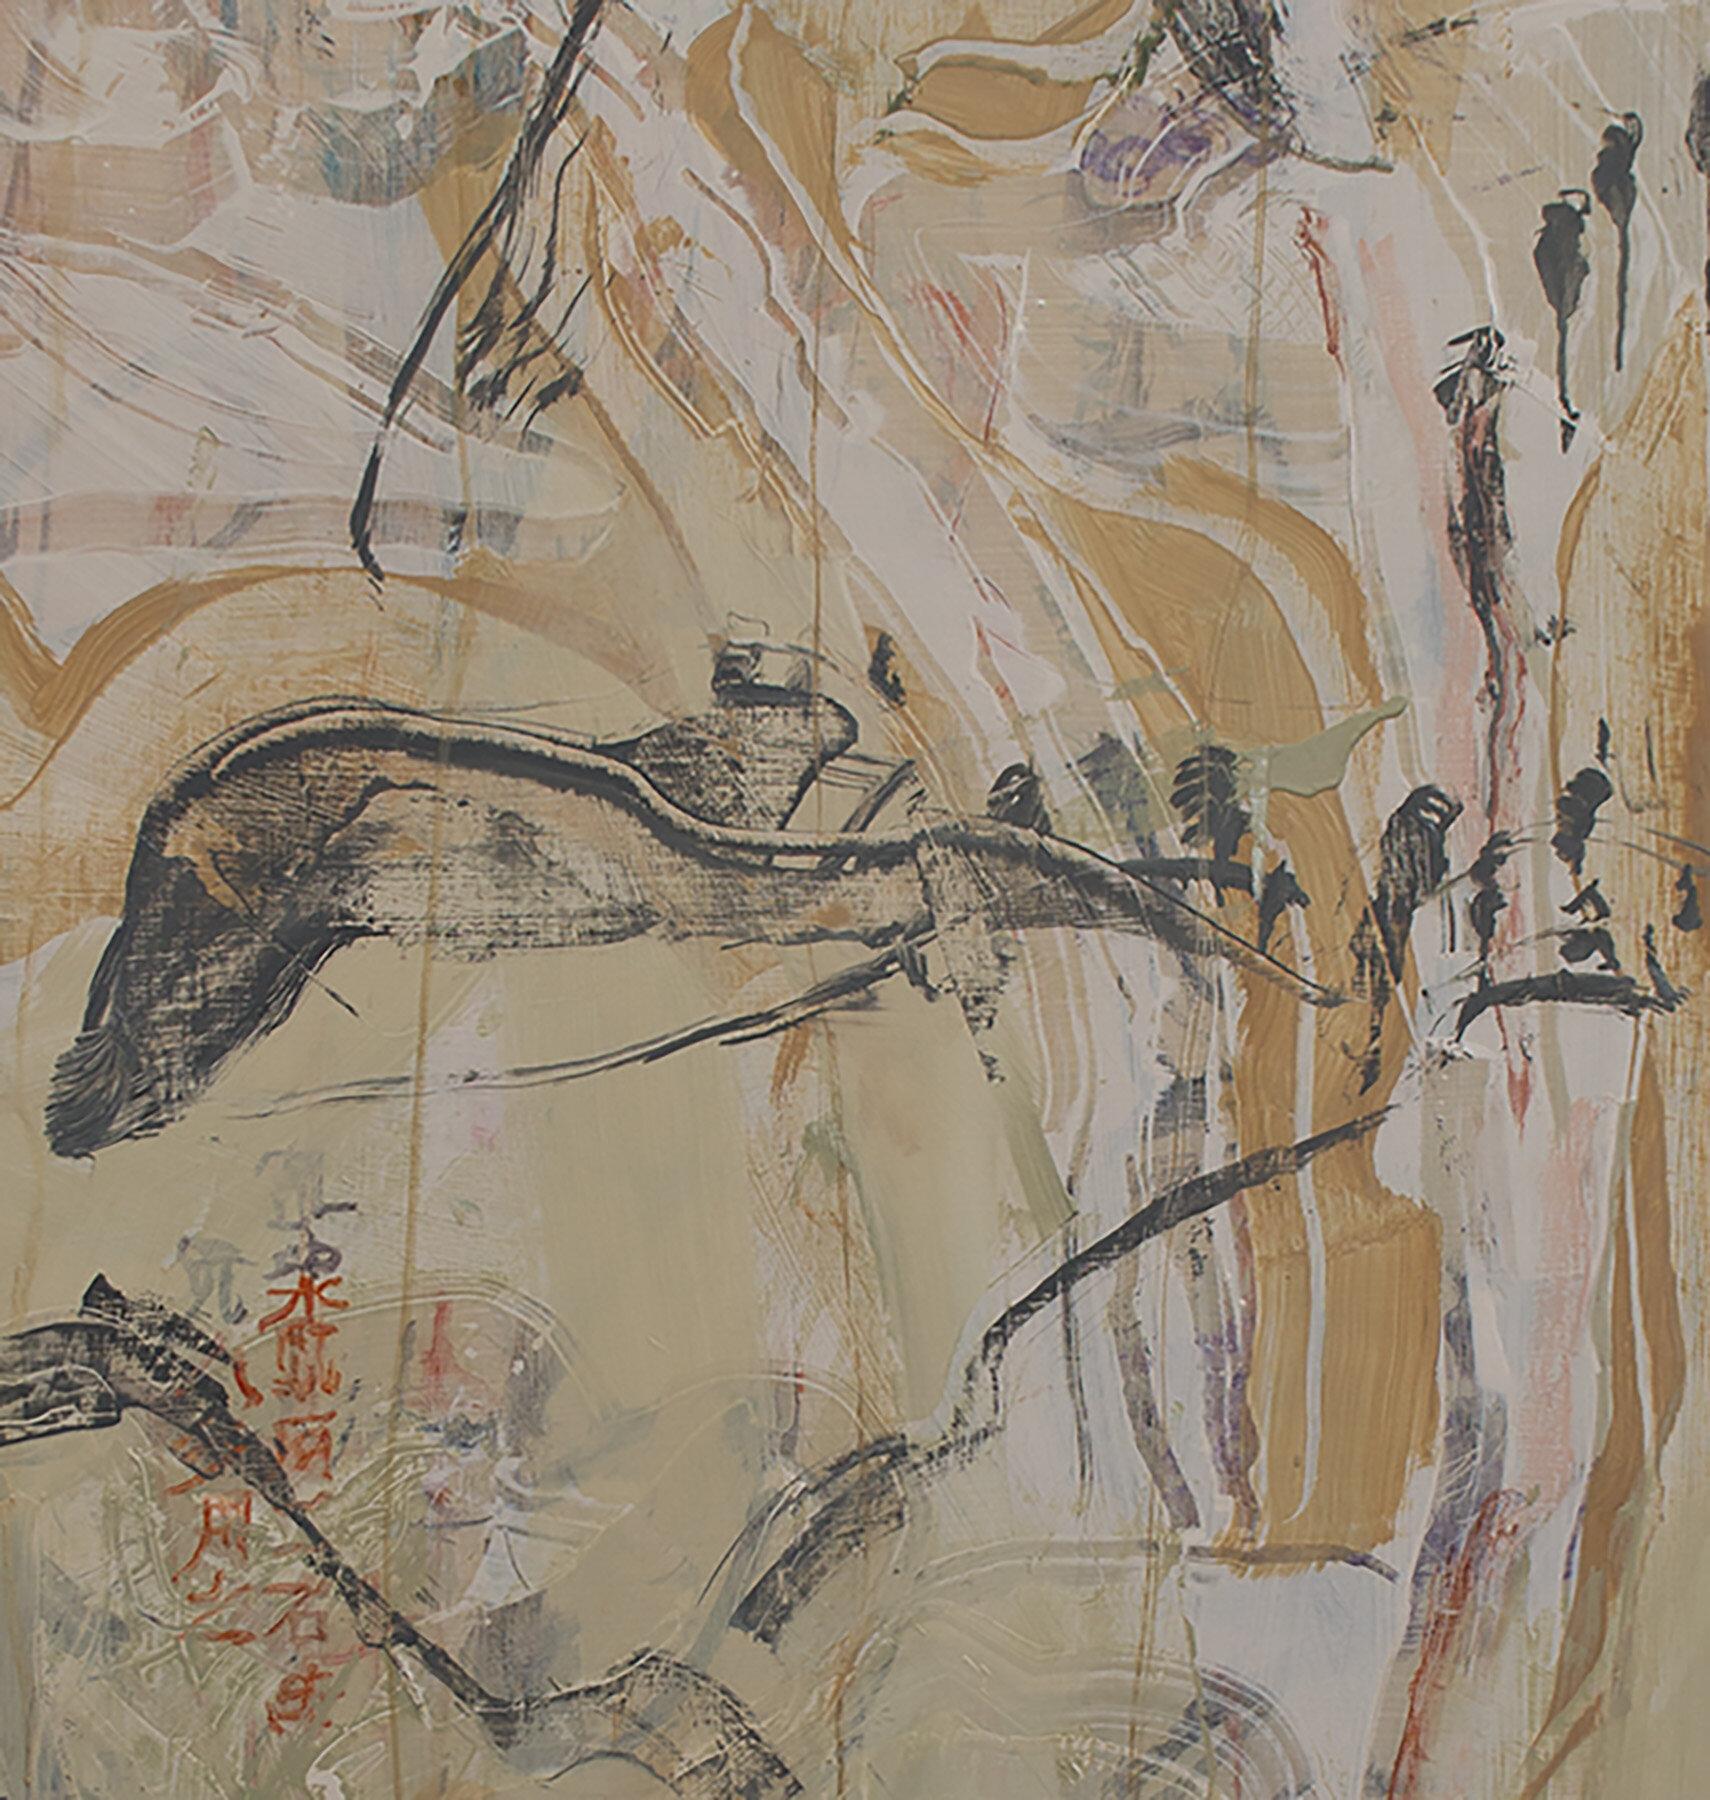 10-16-19 Kwazu no Shosa-CROP.jpg